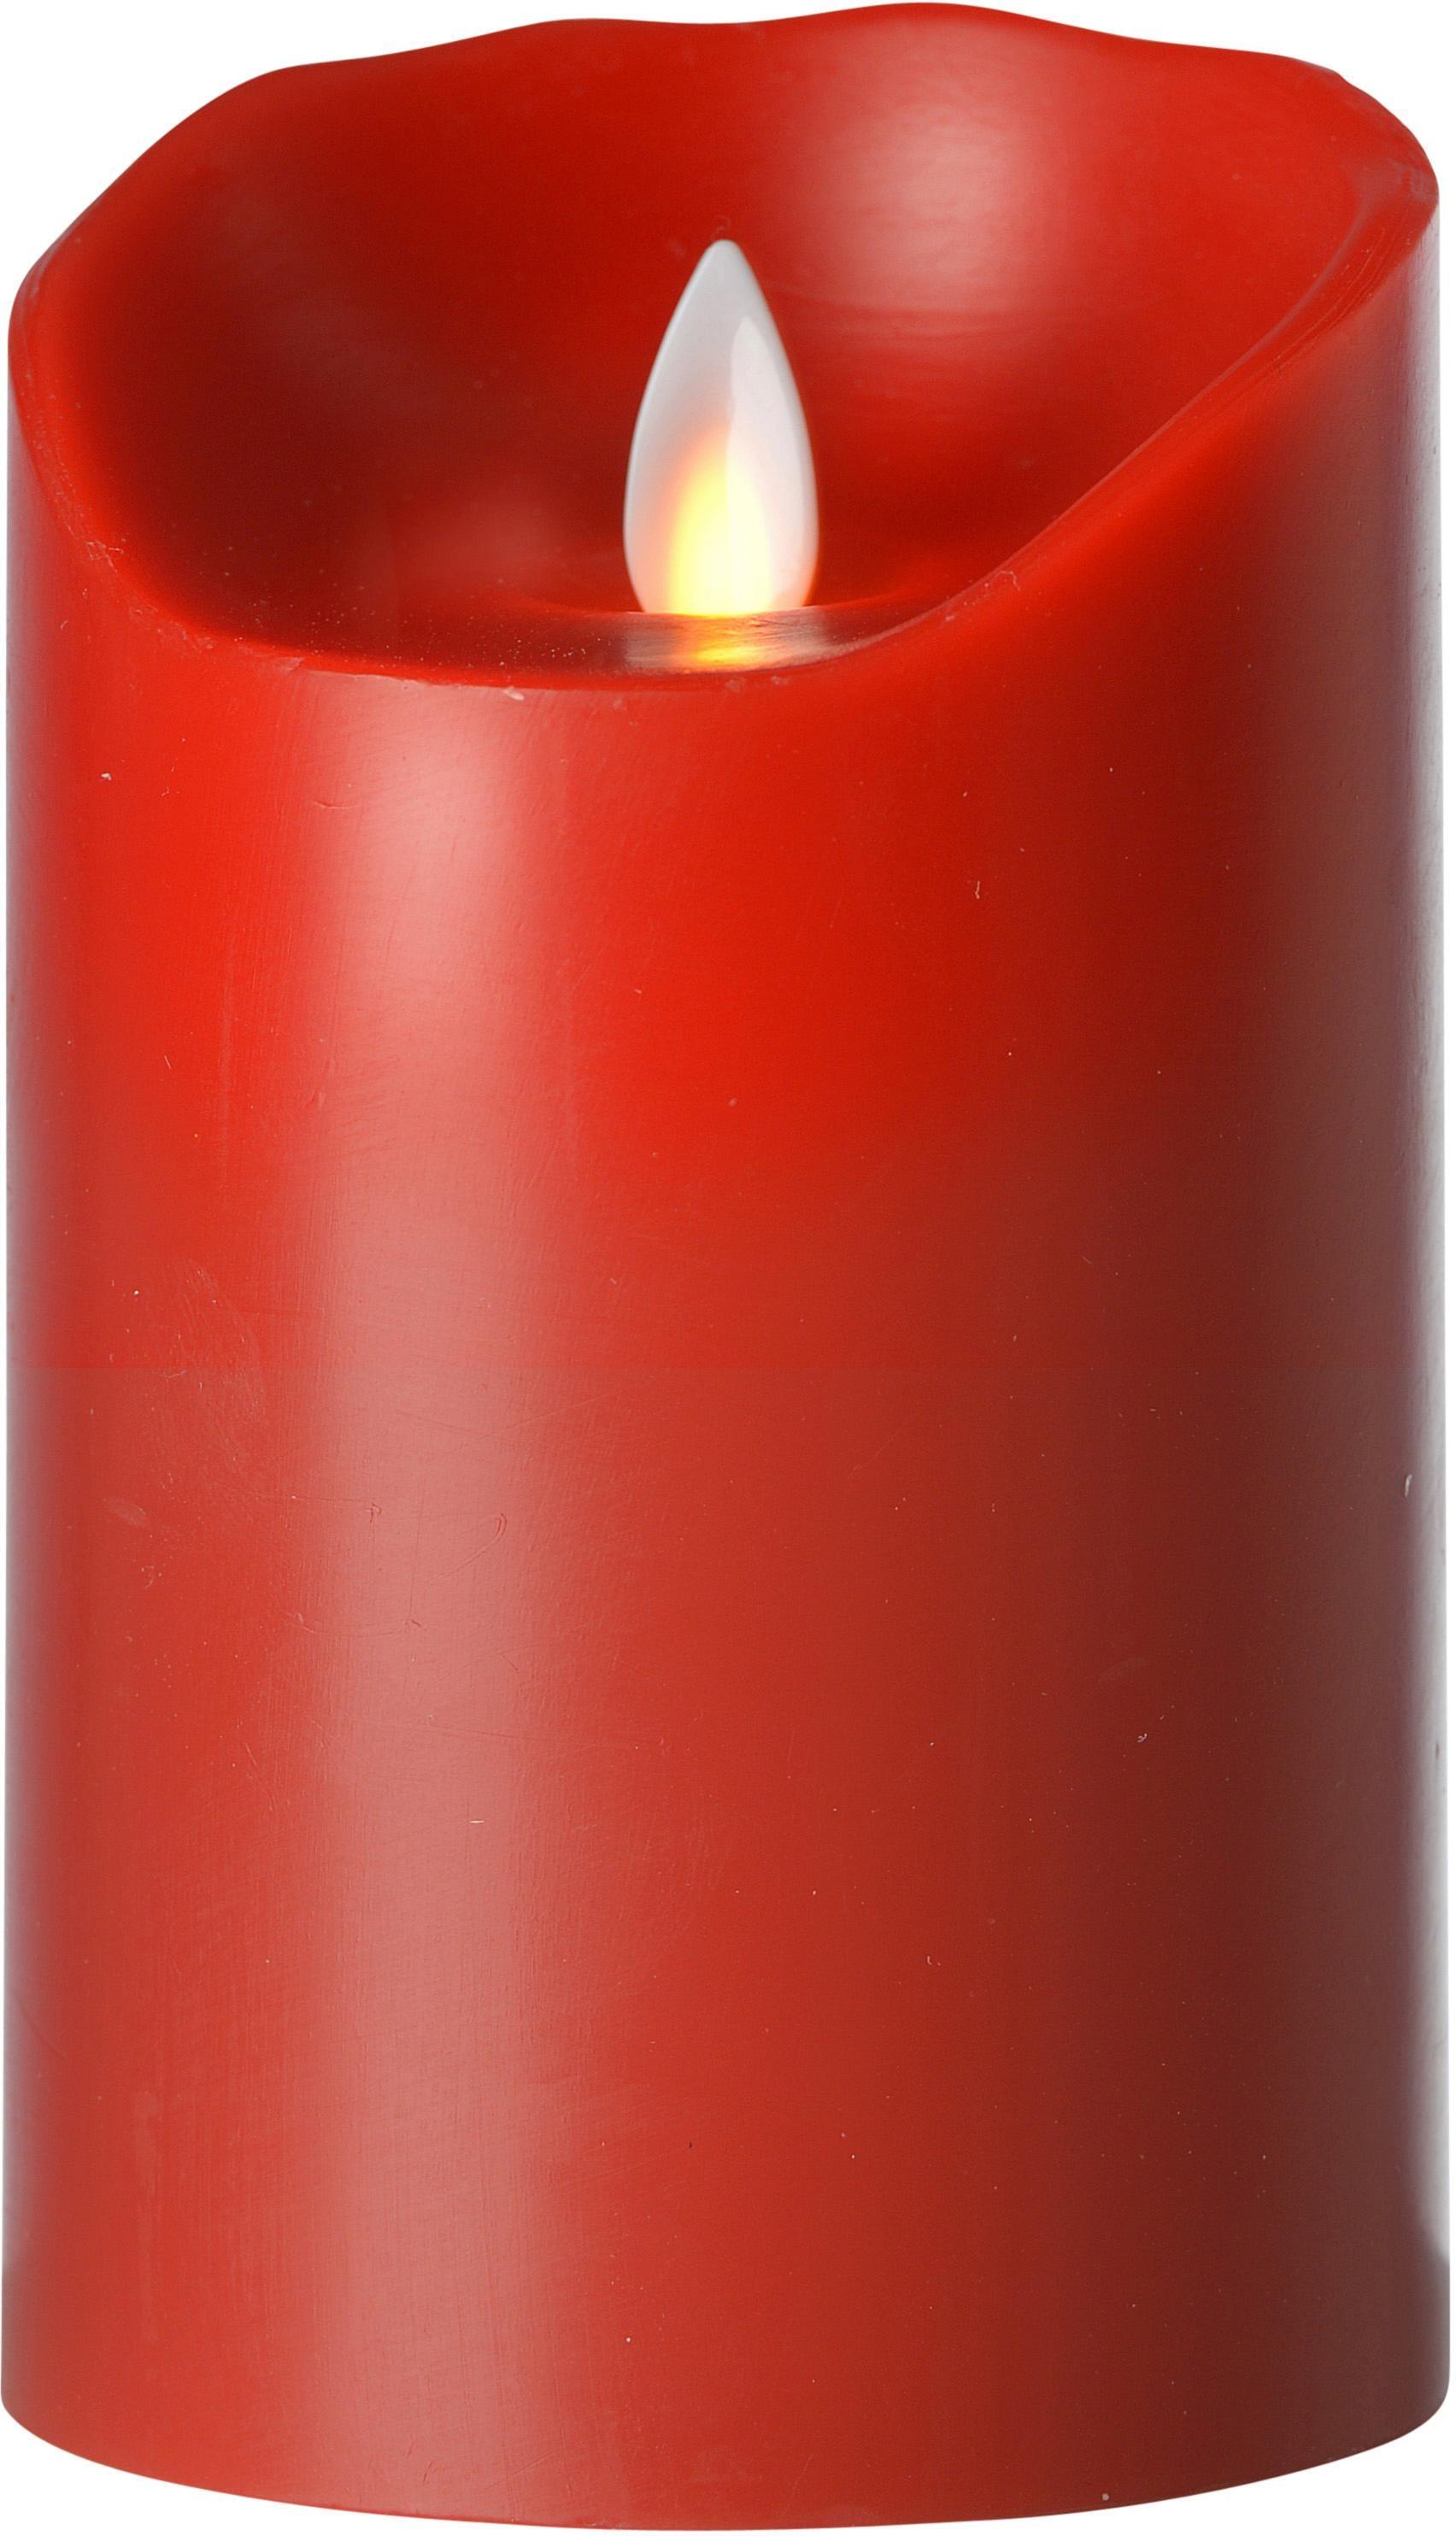 Set aus 10 wei/ß 12,5 und 15cm hohen Kerzen Goobay 3er Set LED Echtwachs-Kerzen